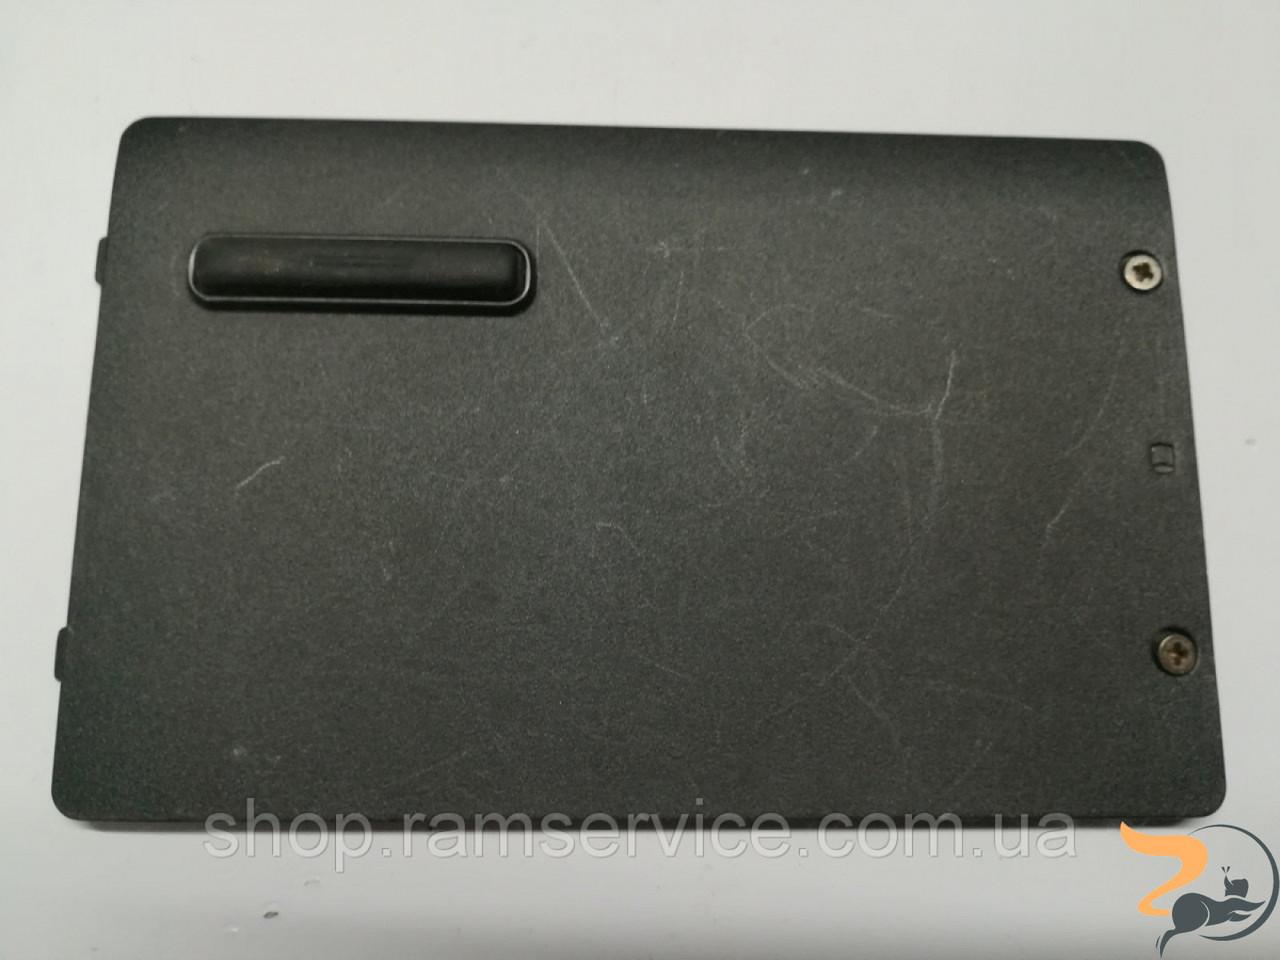 Сервісна кришка для ноутбука Acer Travelmate 4502, 4060, 4600, 1690, б/в